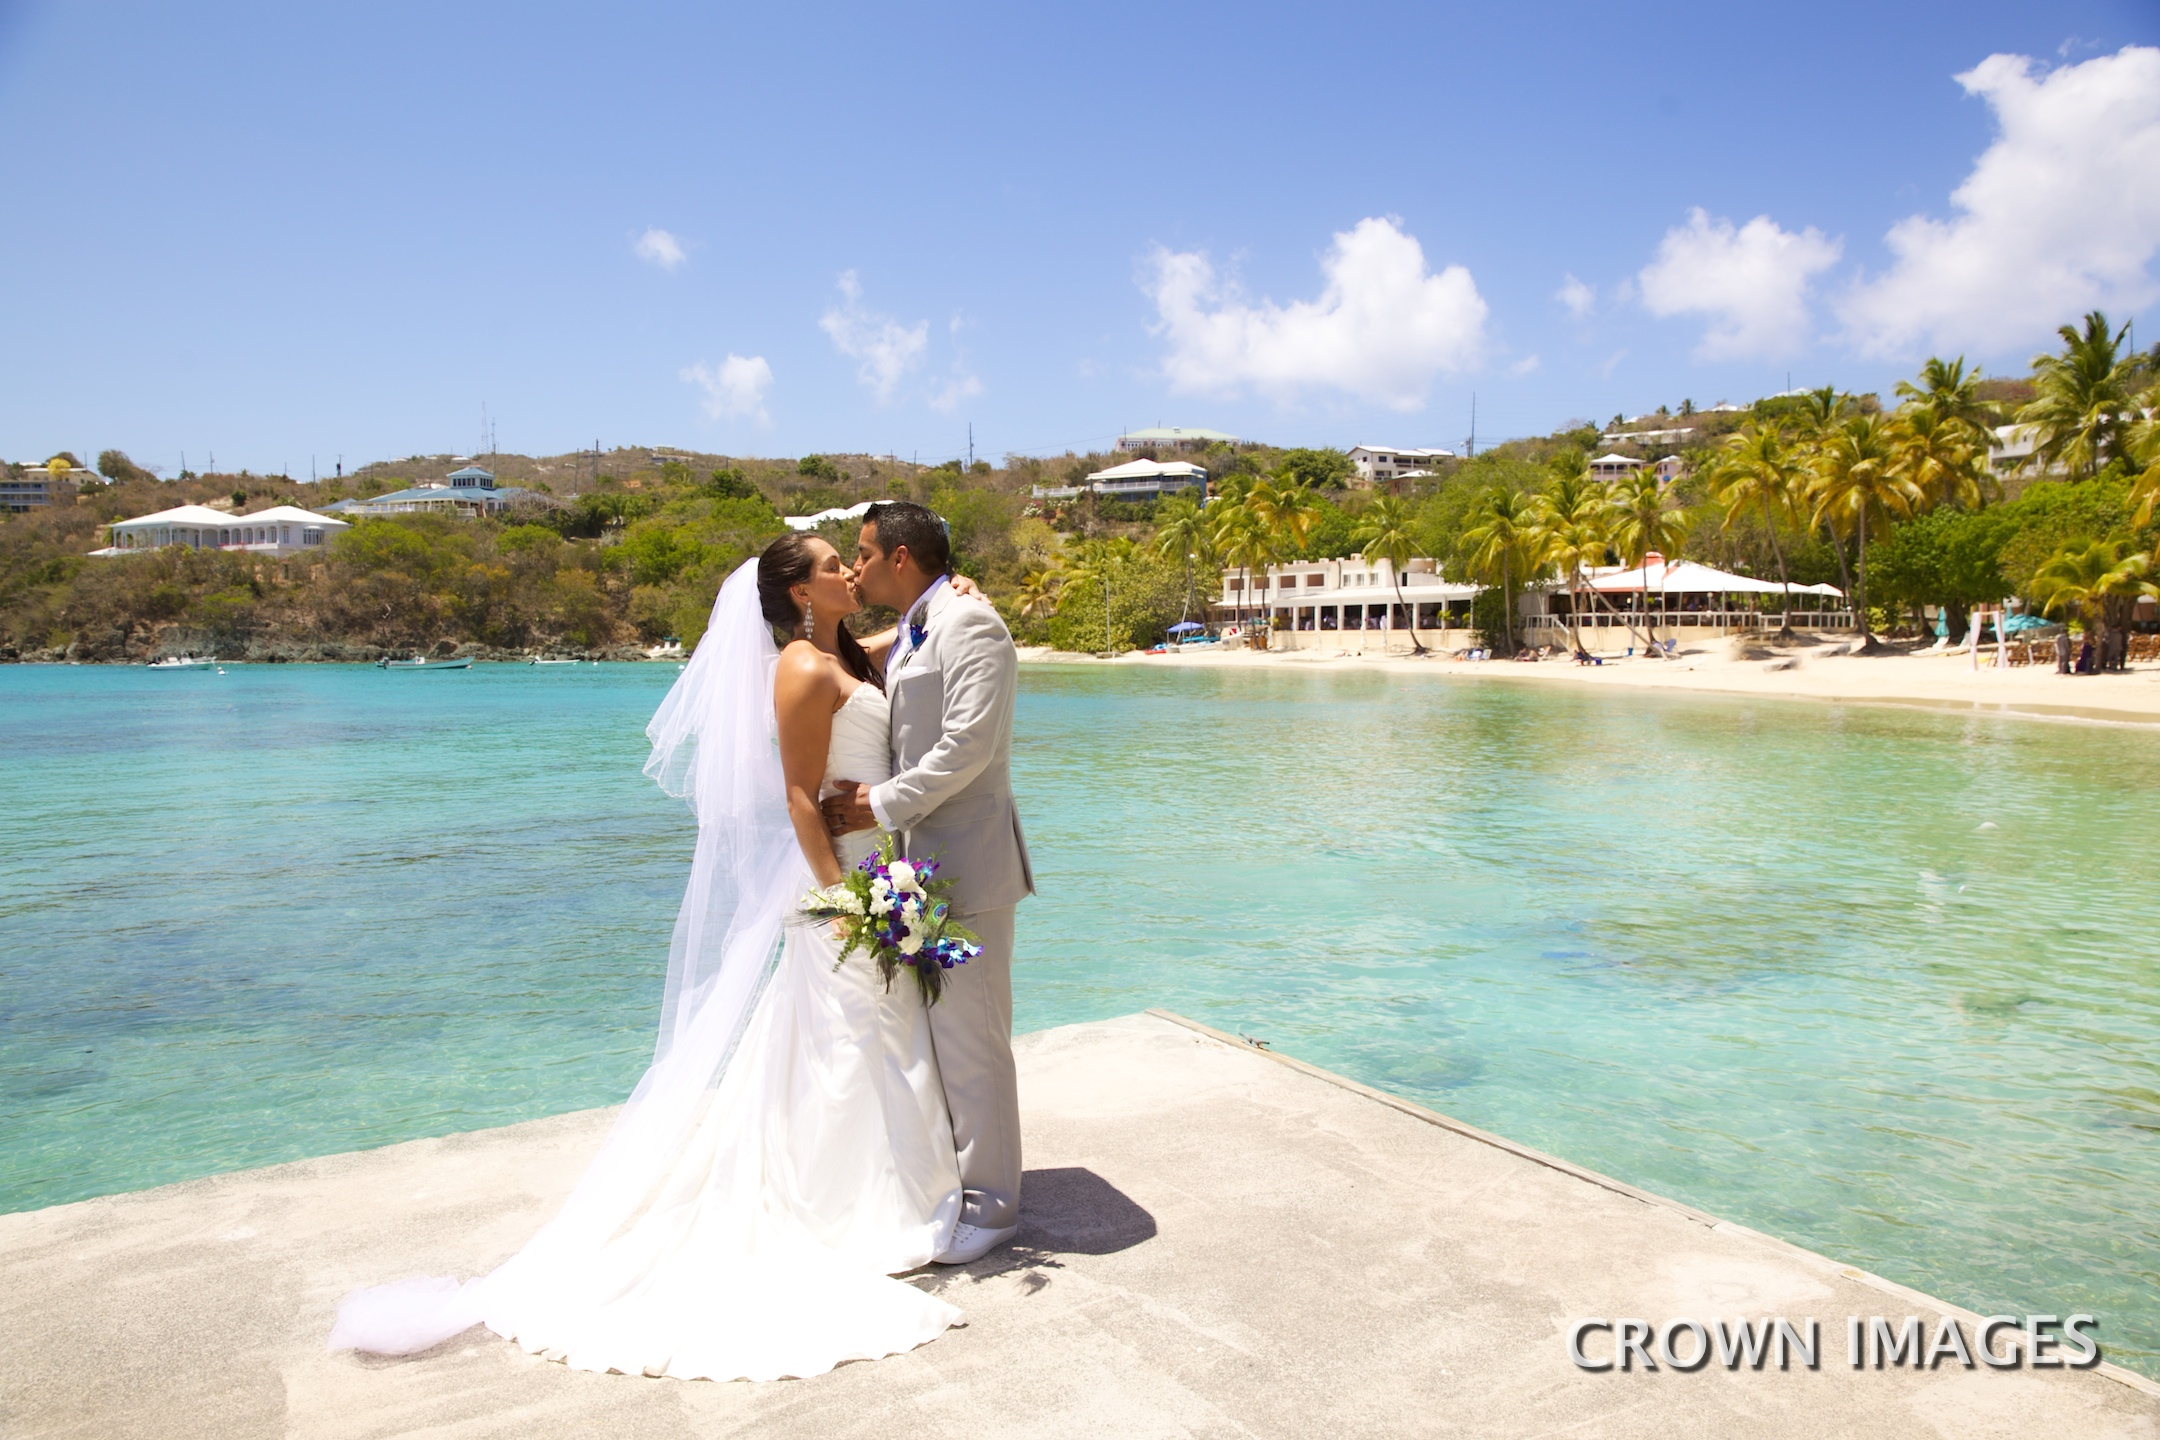 secret harbor wedding location